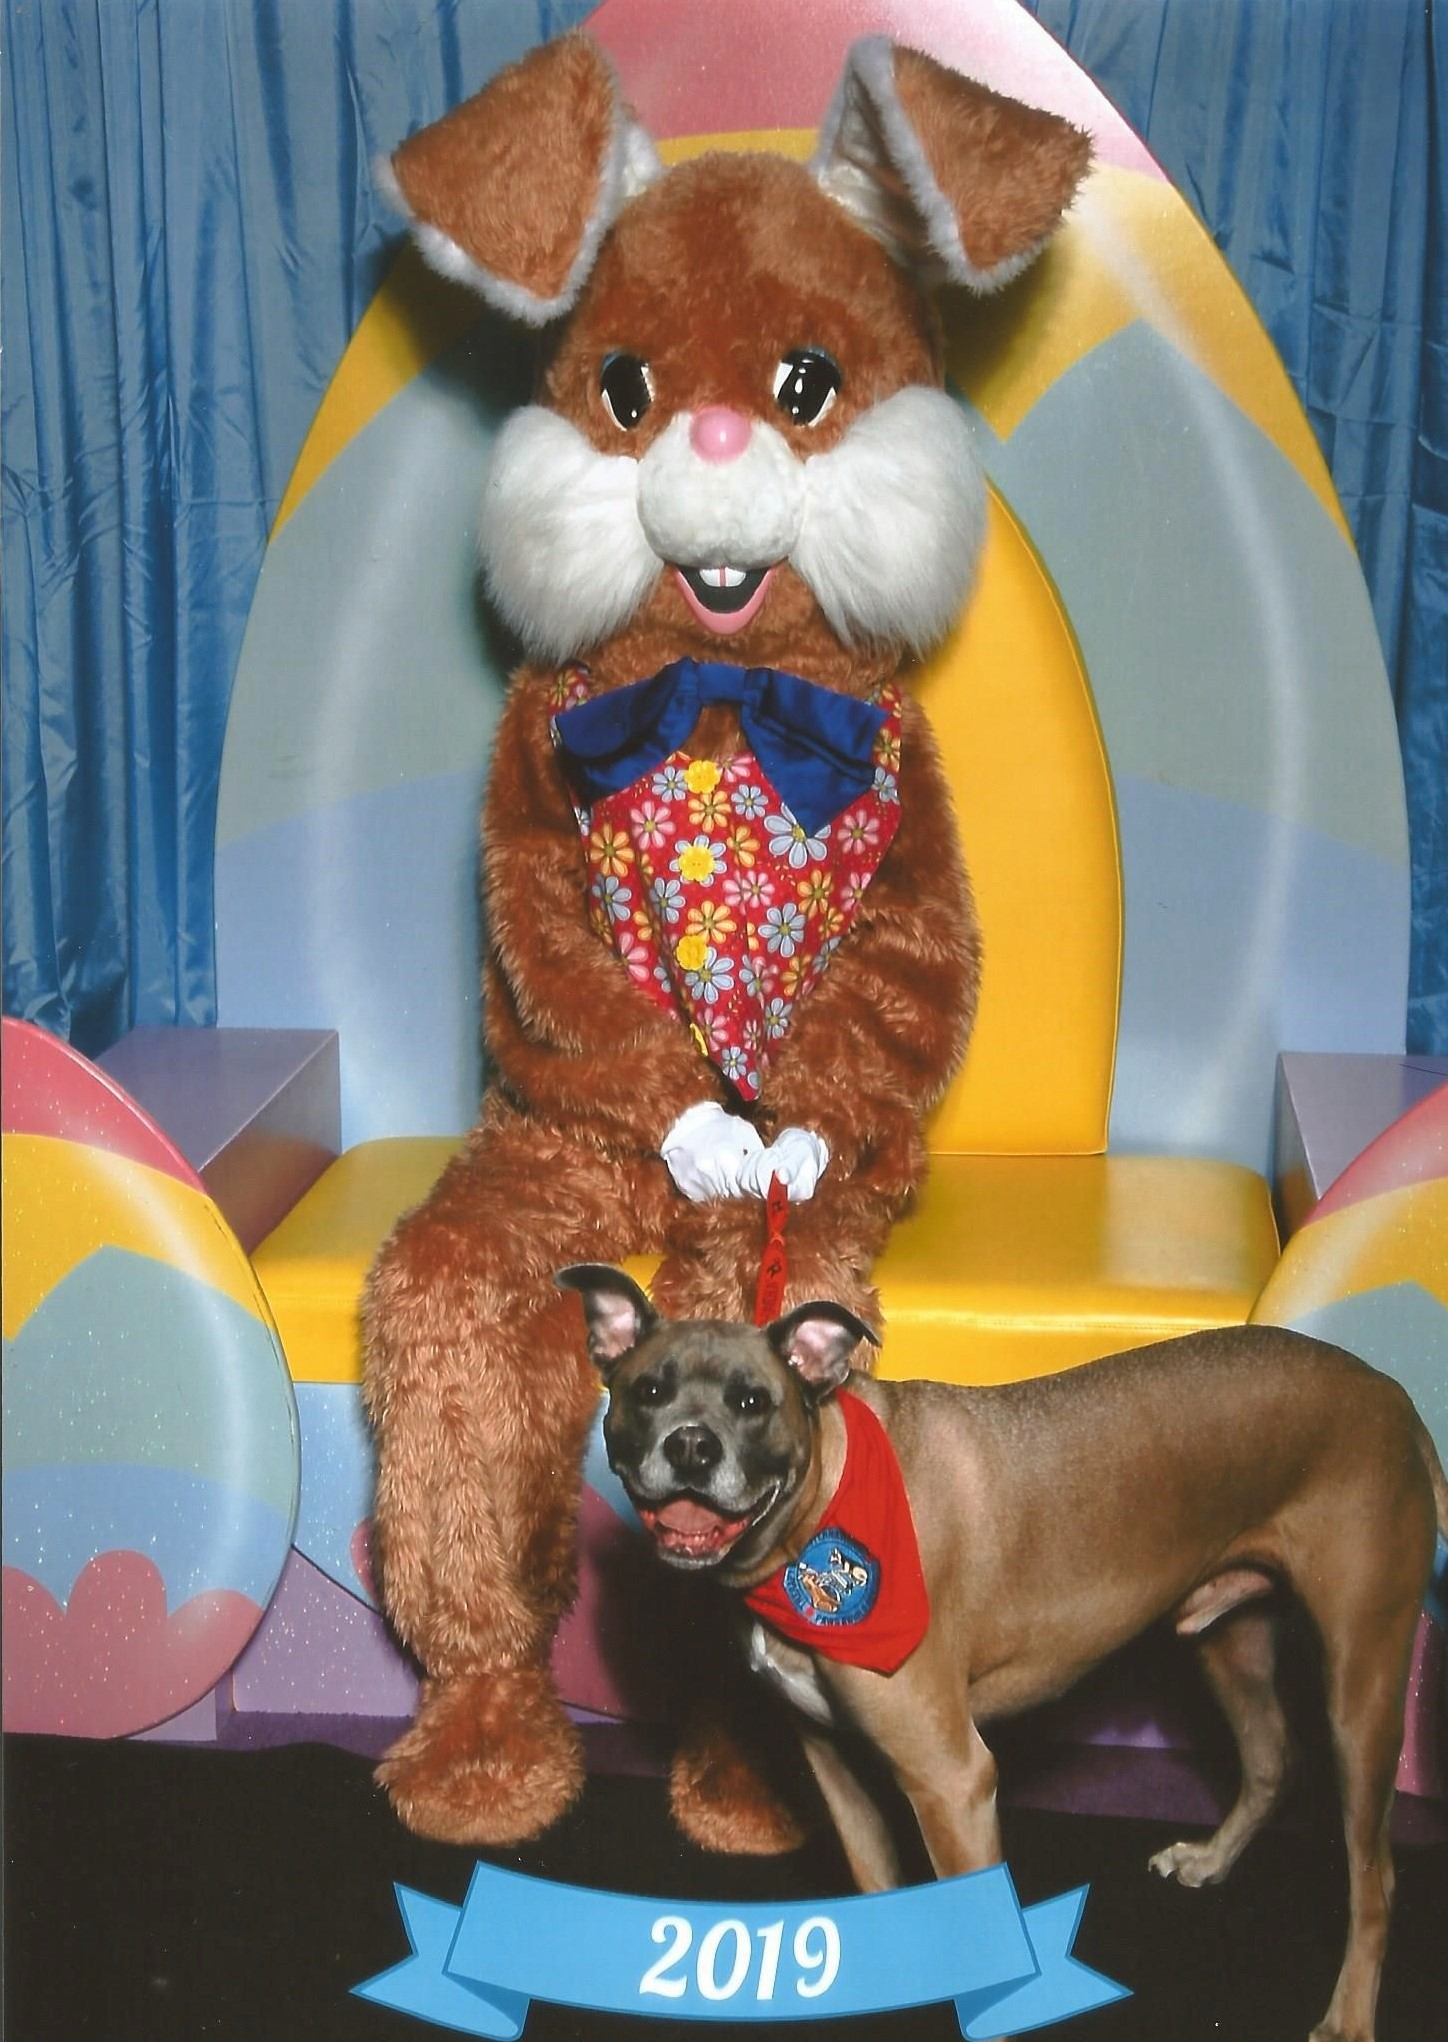 747da1576b81 Medical Pet Shirt For Dogs Uk - DREAMWORKS